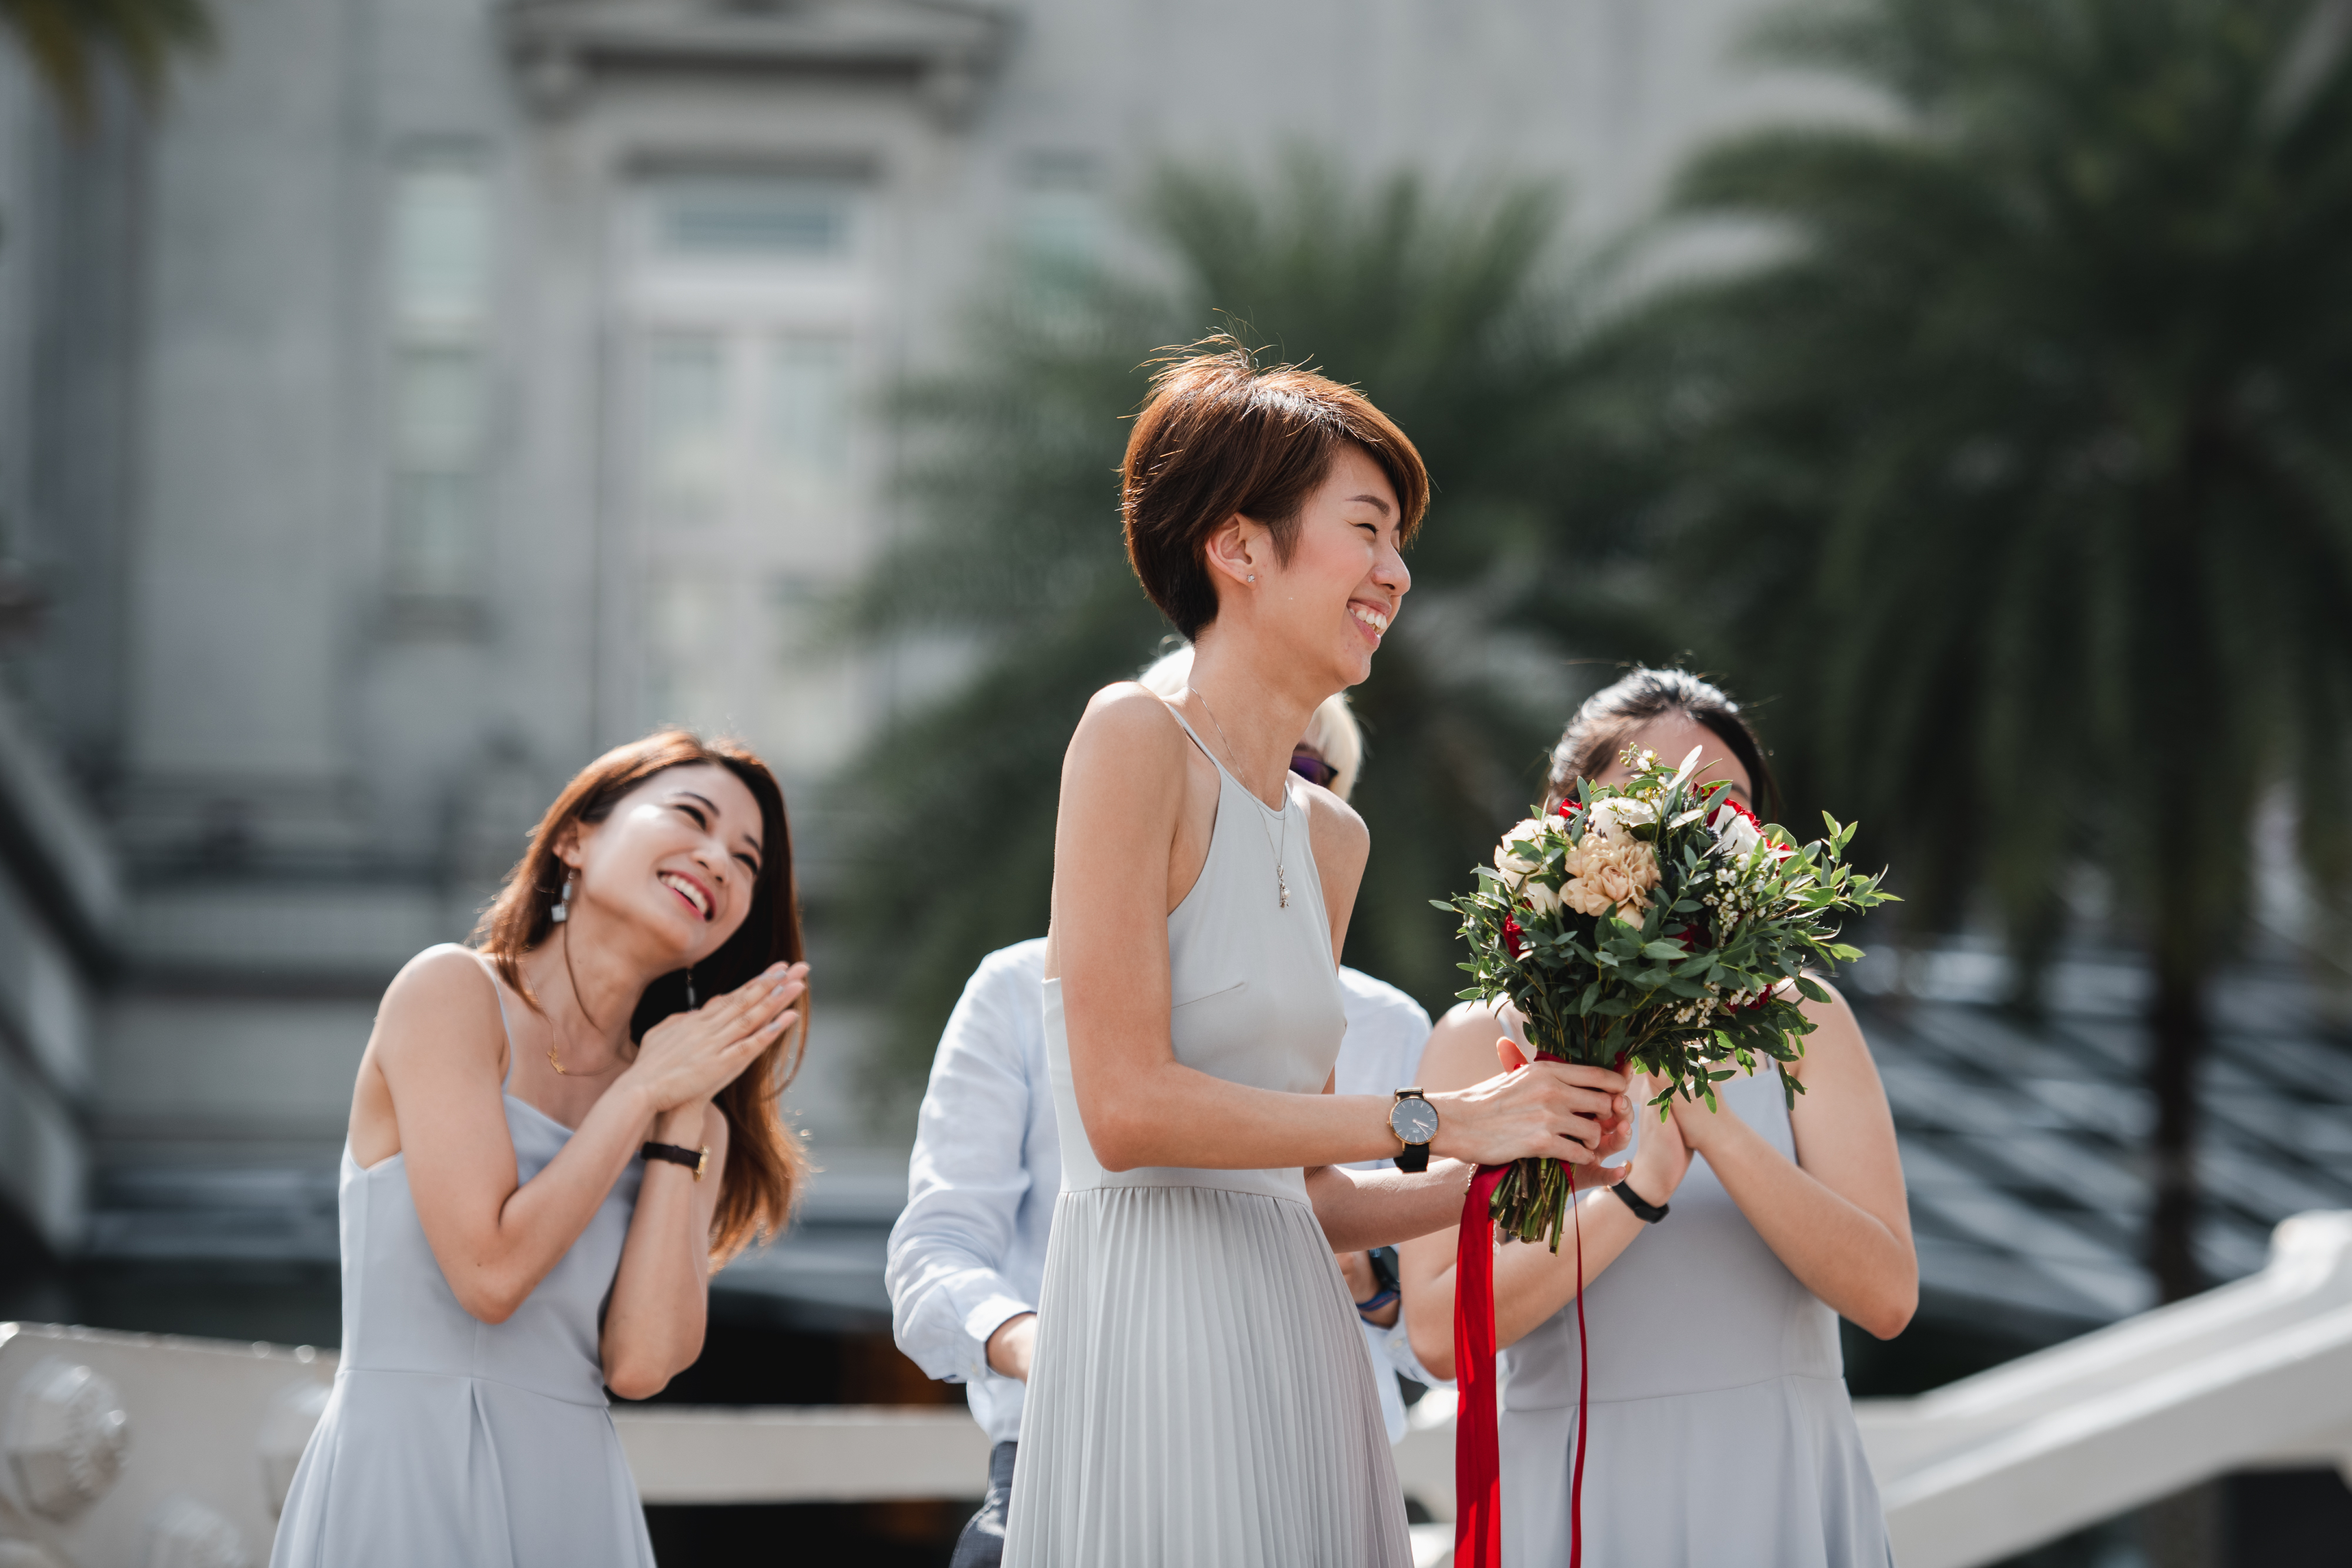 Kai Sun & Wen Jing - 235